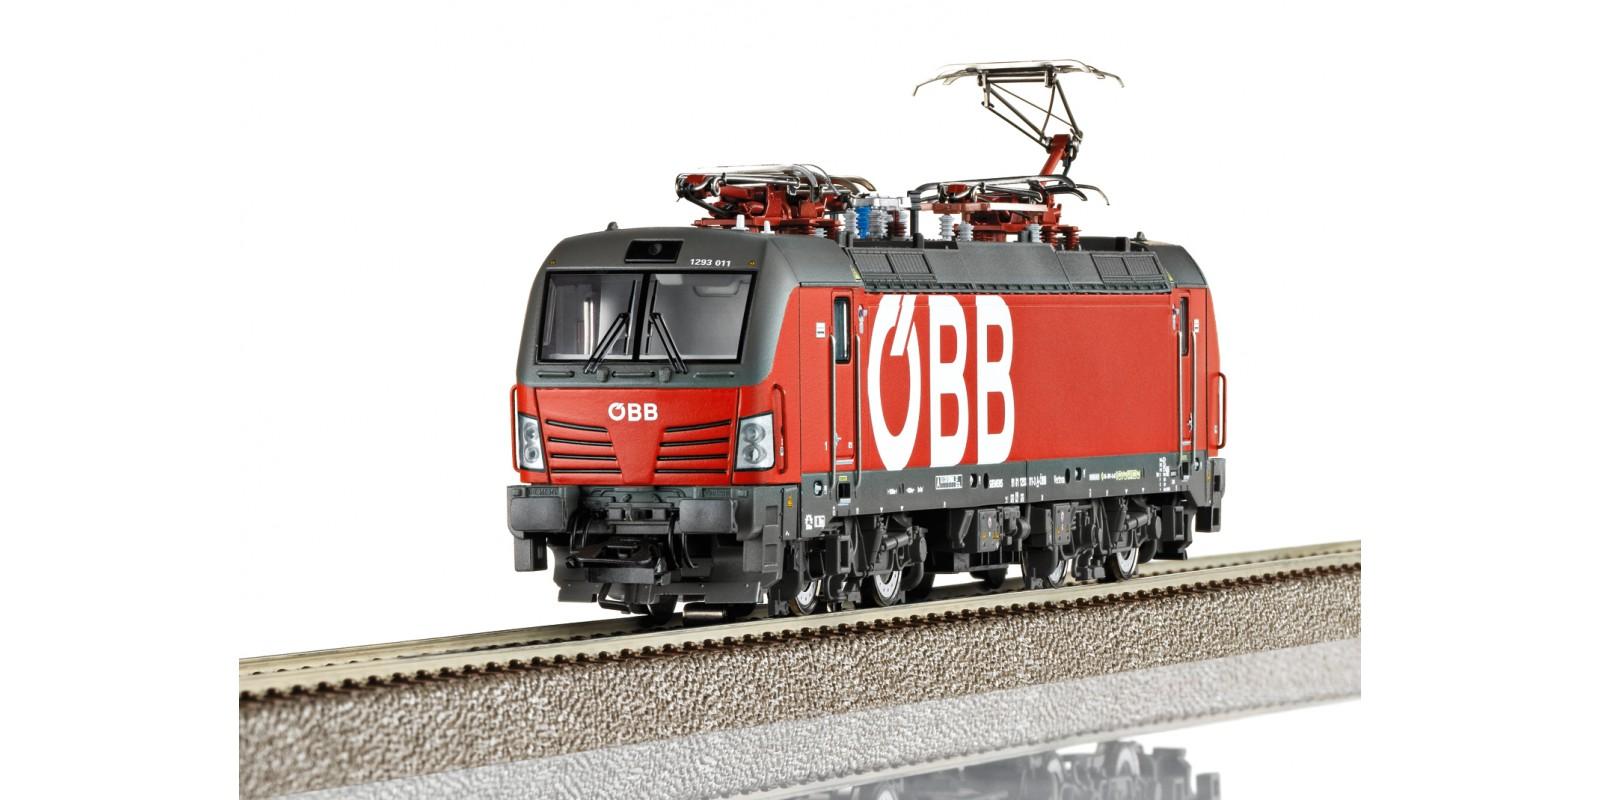 T25191 Class 1293 Electric Locomotive